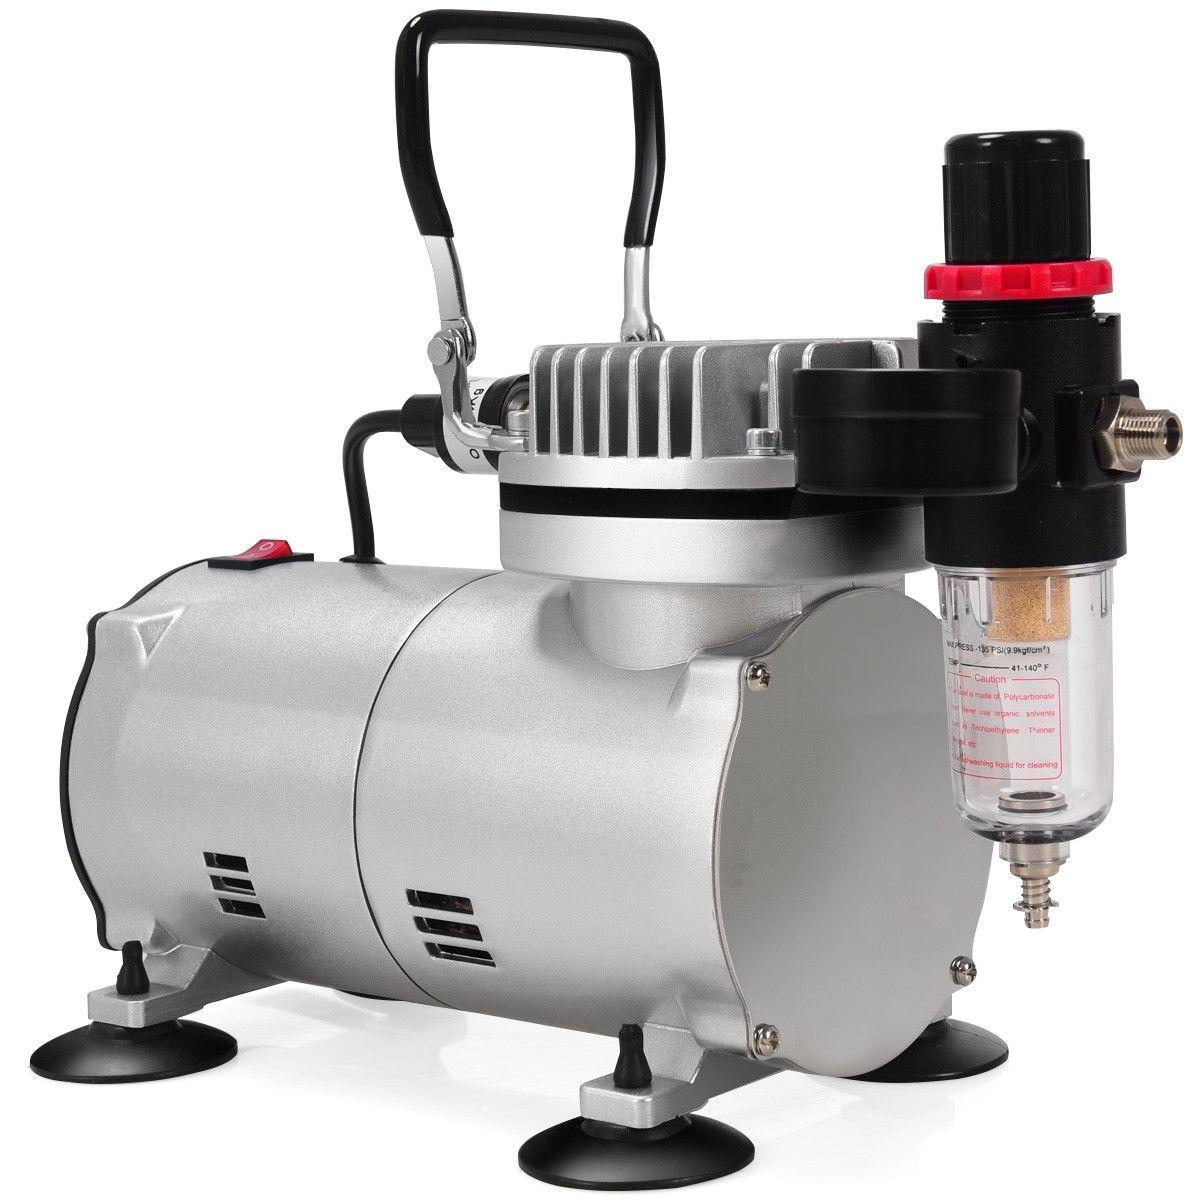 3 Compressor Kit DualAction Spray Air Brush Set